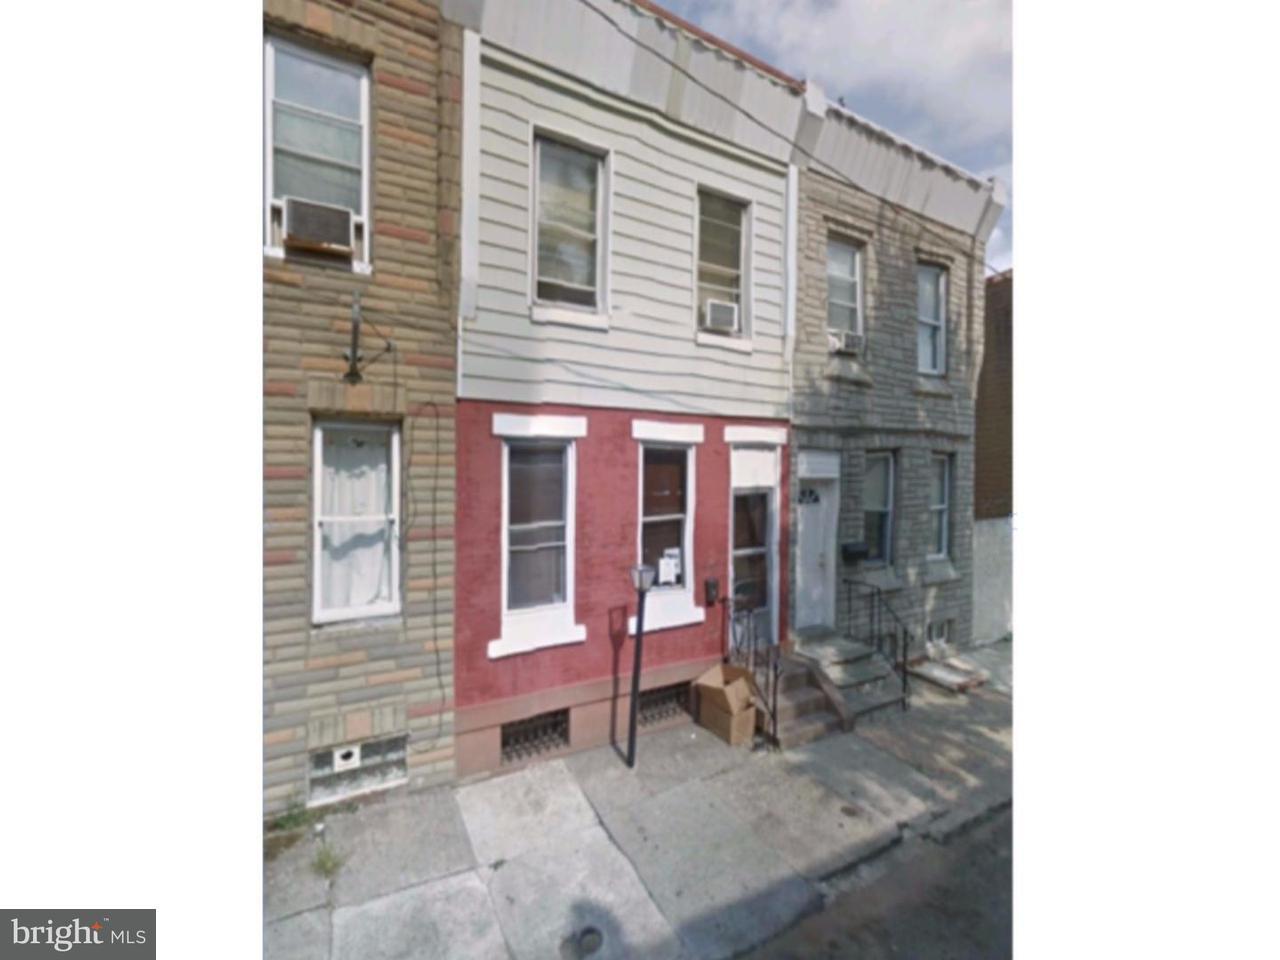 2125 E Monmouth Philadelphia, PA 19134